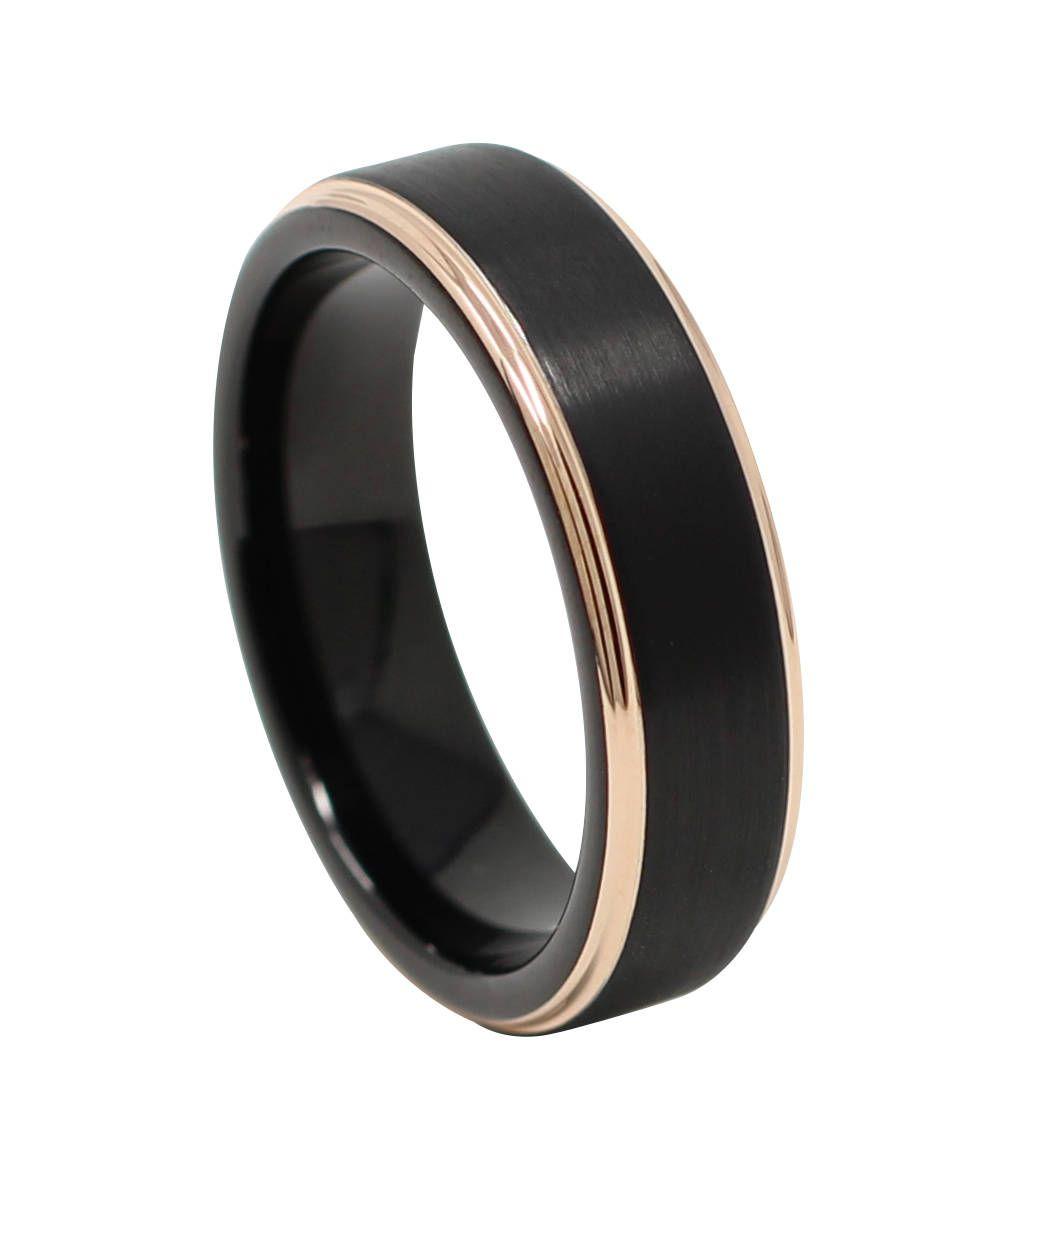 Rose Gold And Black 6mm Men S Tungsten Wedding Band Thin Etsy Mens Wedding Bands Tungsten Black Tungsten Rings Tungsten Wedding Bands